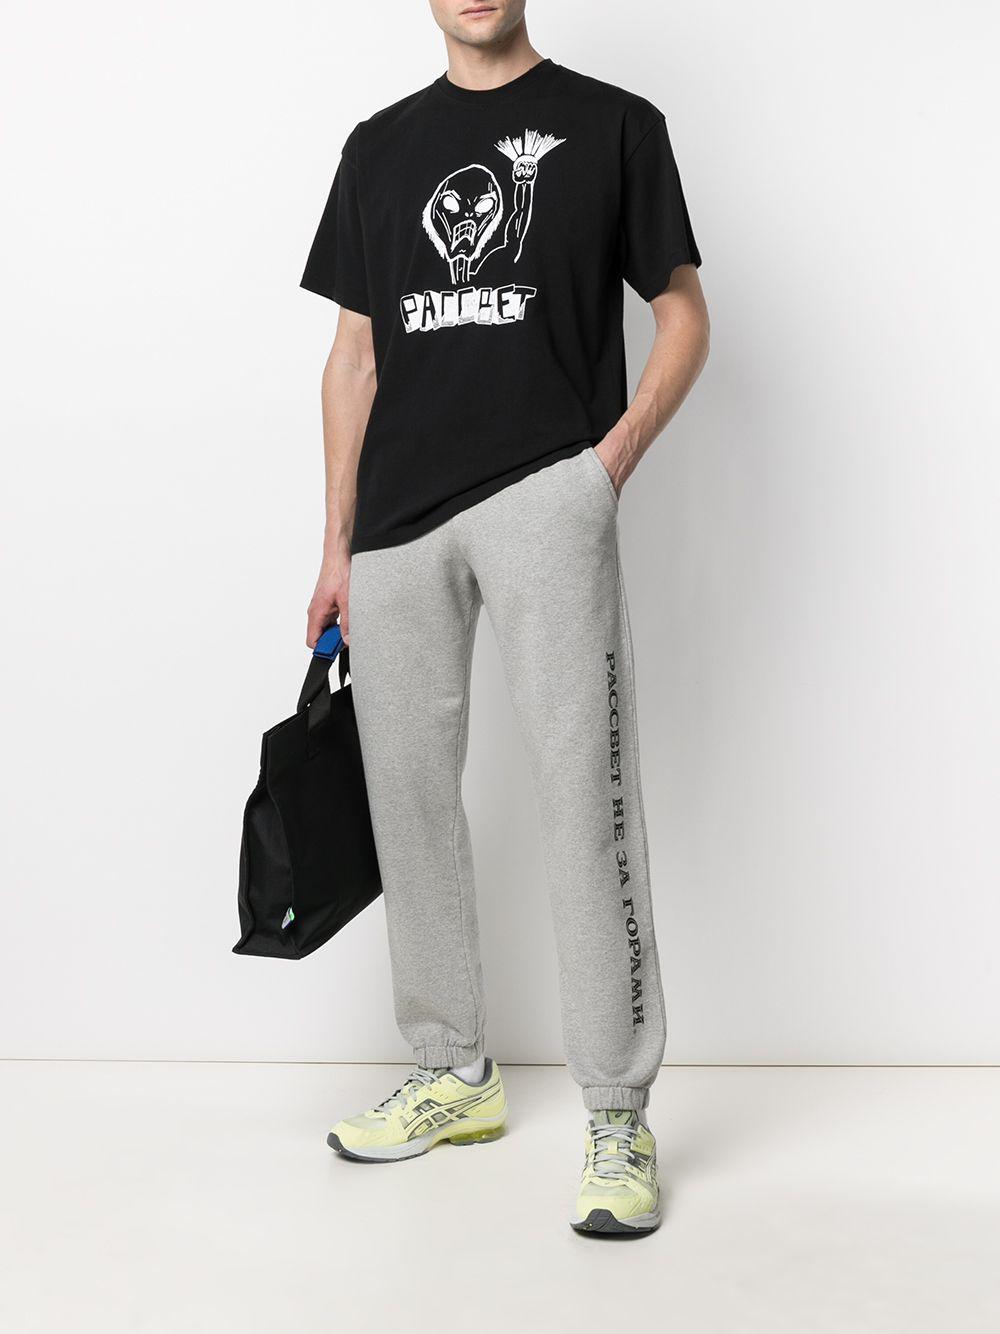 Rassvet t-shirt con stampa uomo RASSVET | T-shirt | PACC8T003BLACK